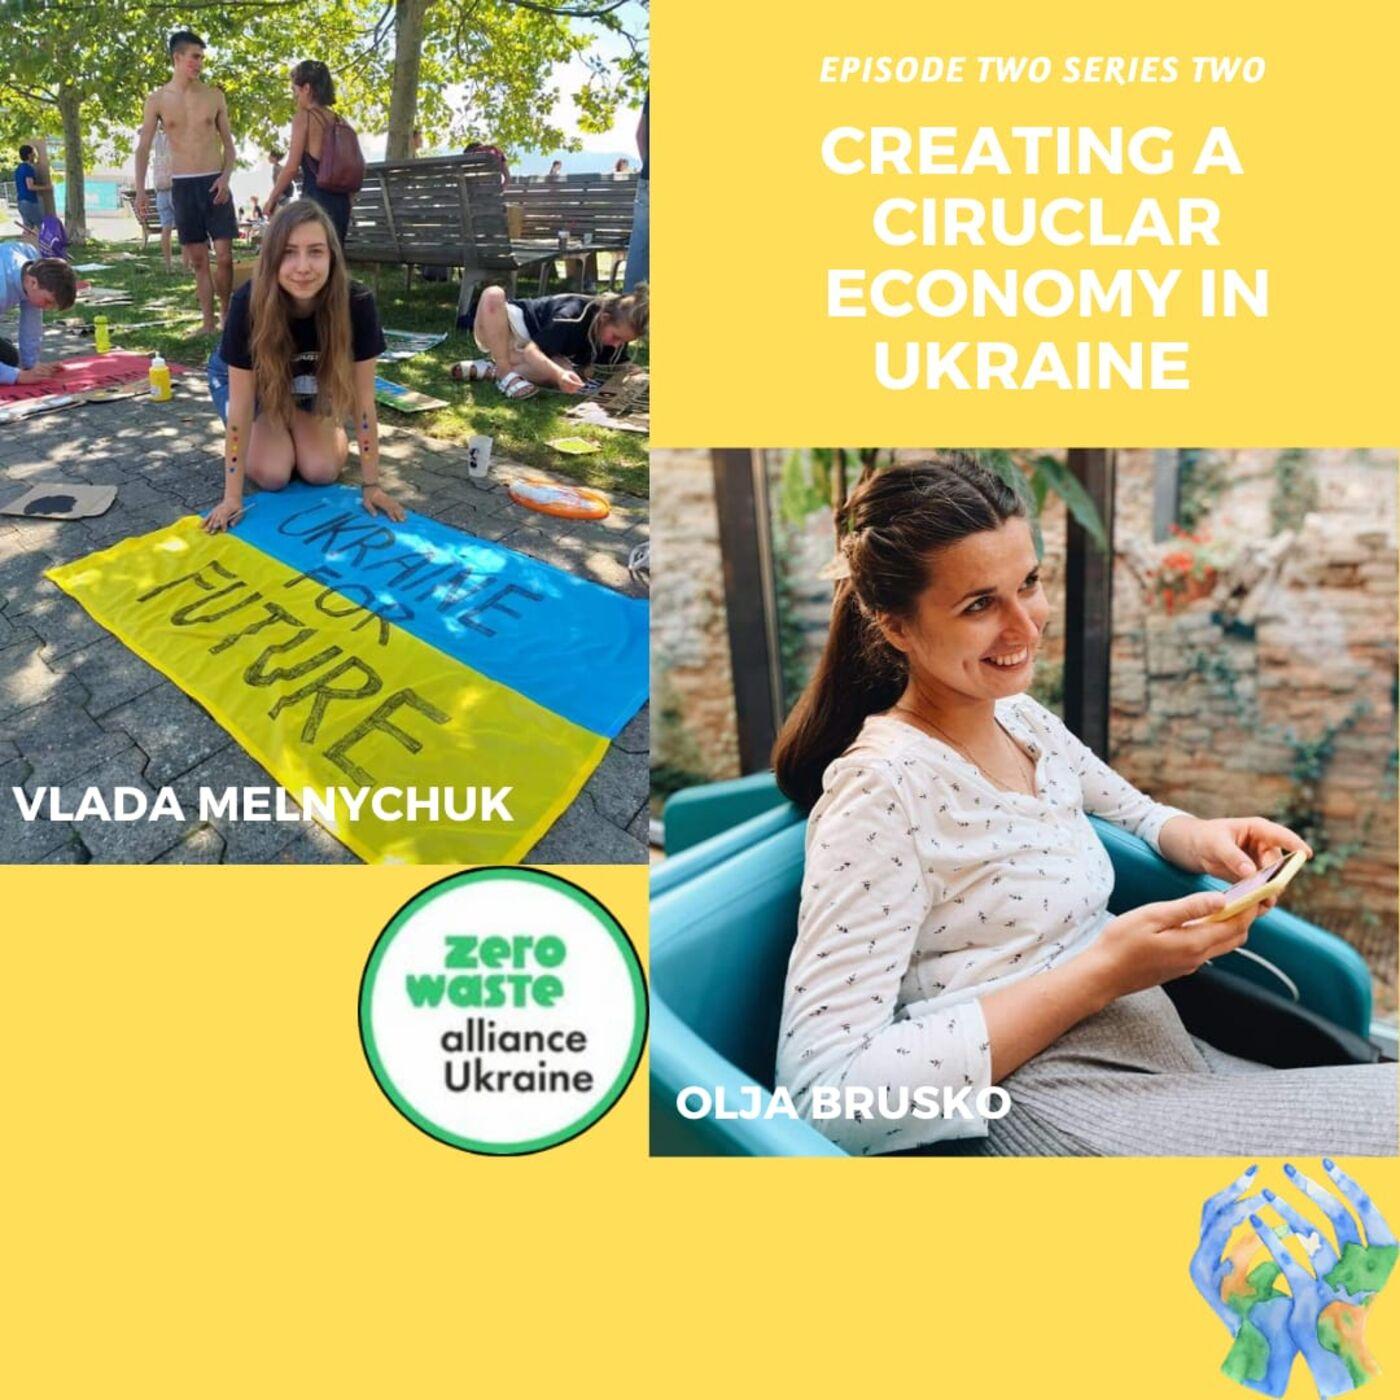 Creating a Circular Economy in Ukraine with Vlada Melnychuk and Olja Brusko